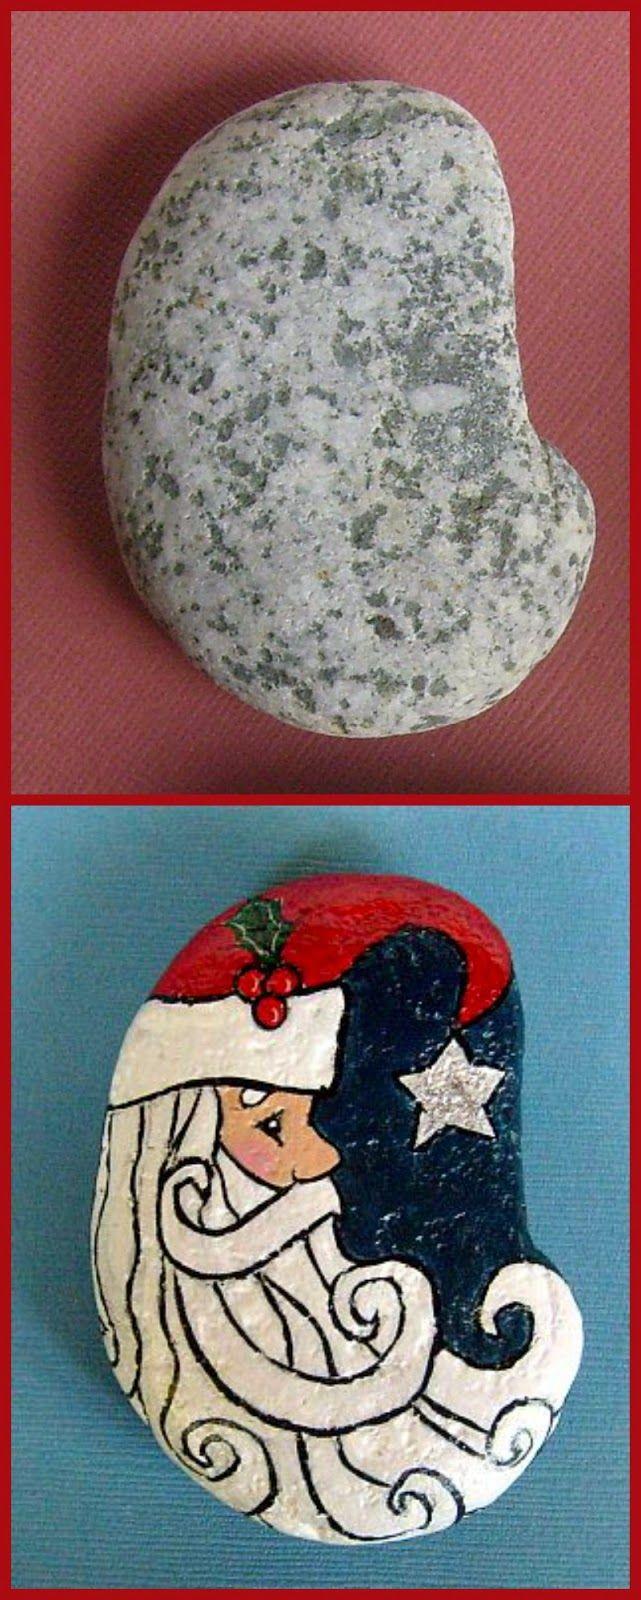 http://paintingrocks.blogspot.com/2014/12/before-and-after-painted-rocks.html?utm_source=feedburner